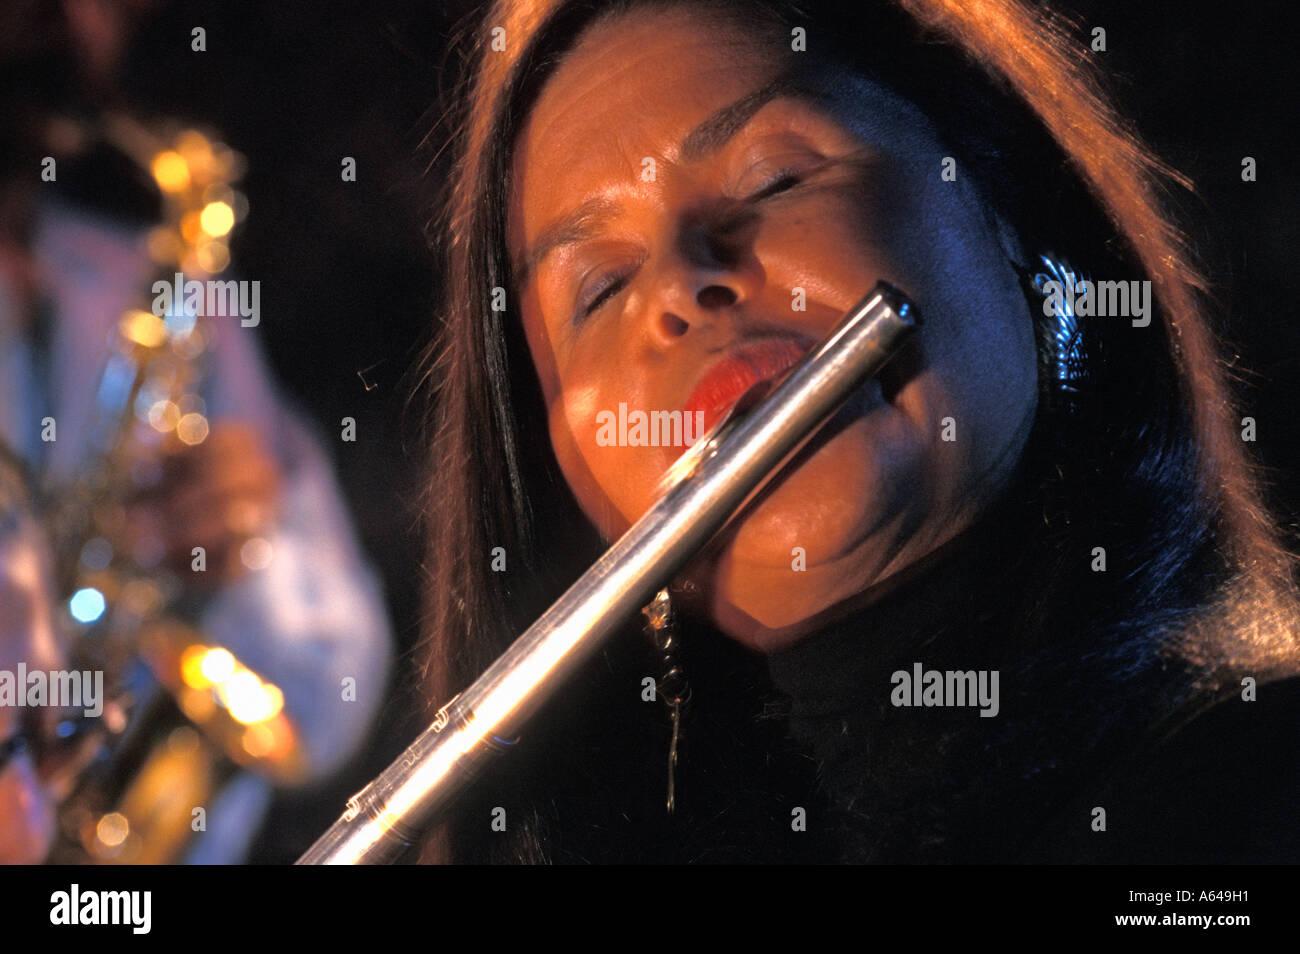 Jazz flautist - Stock Image